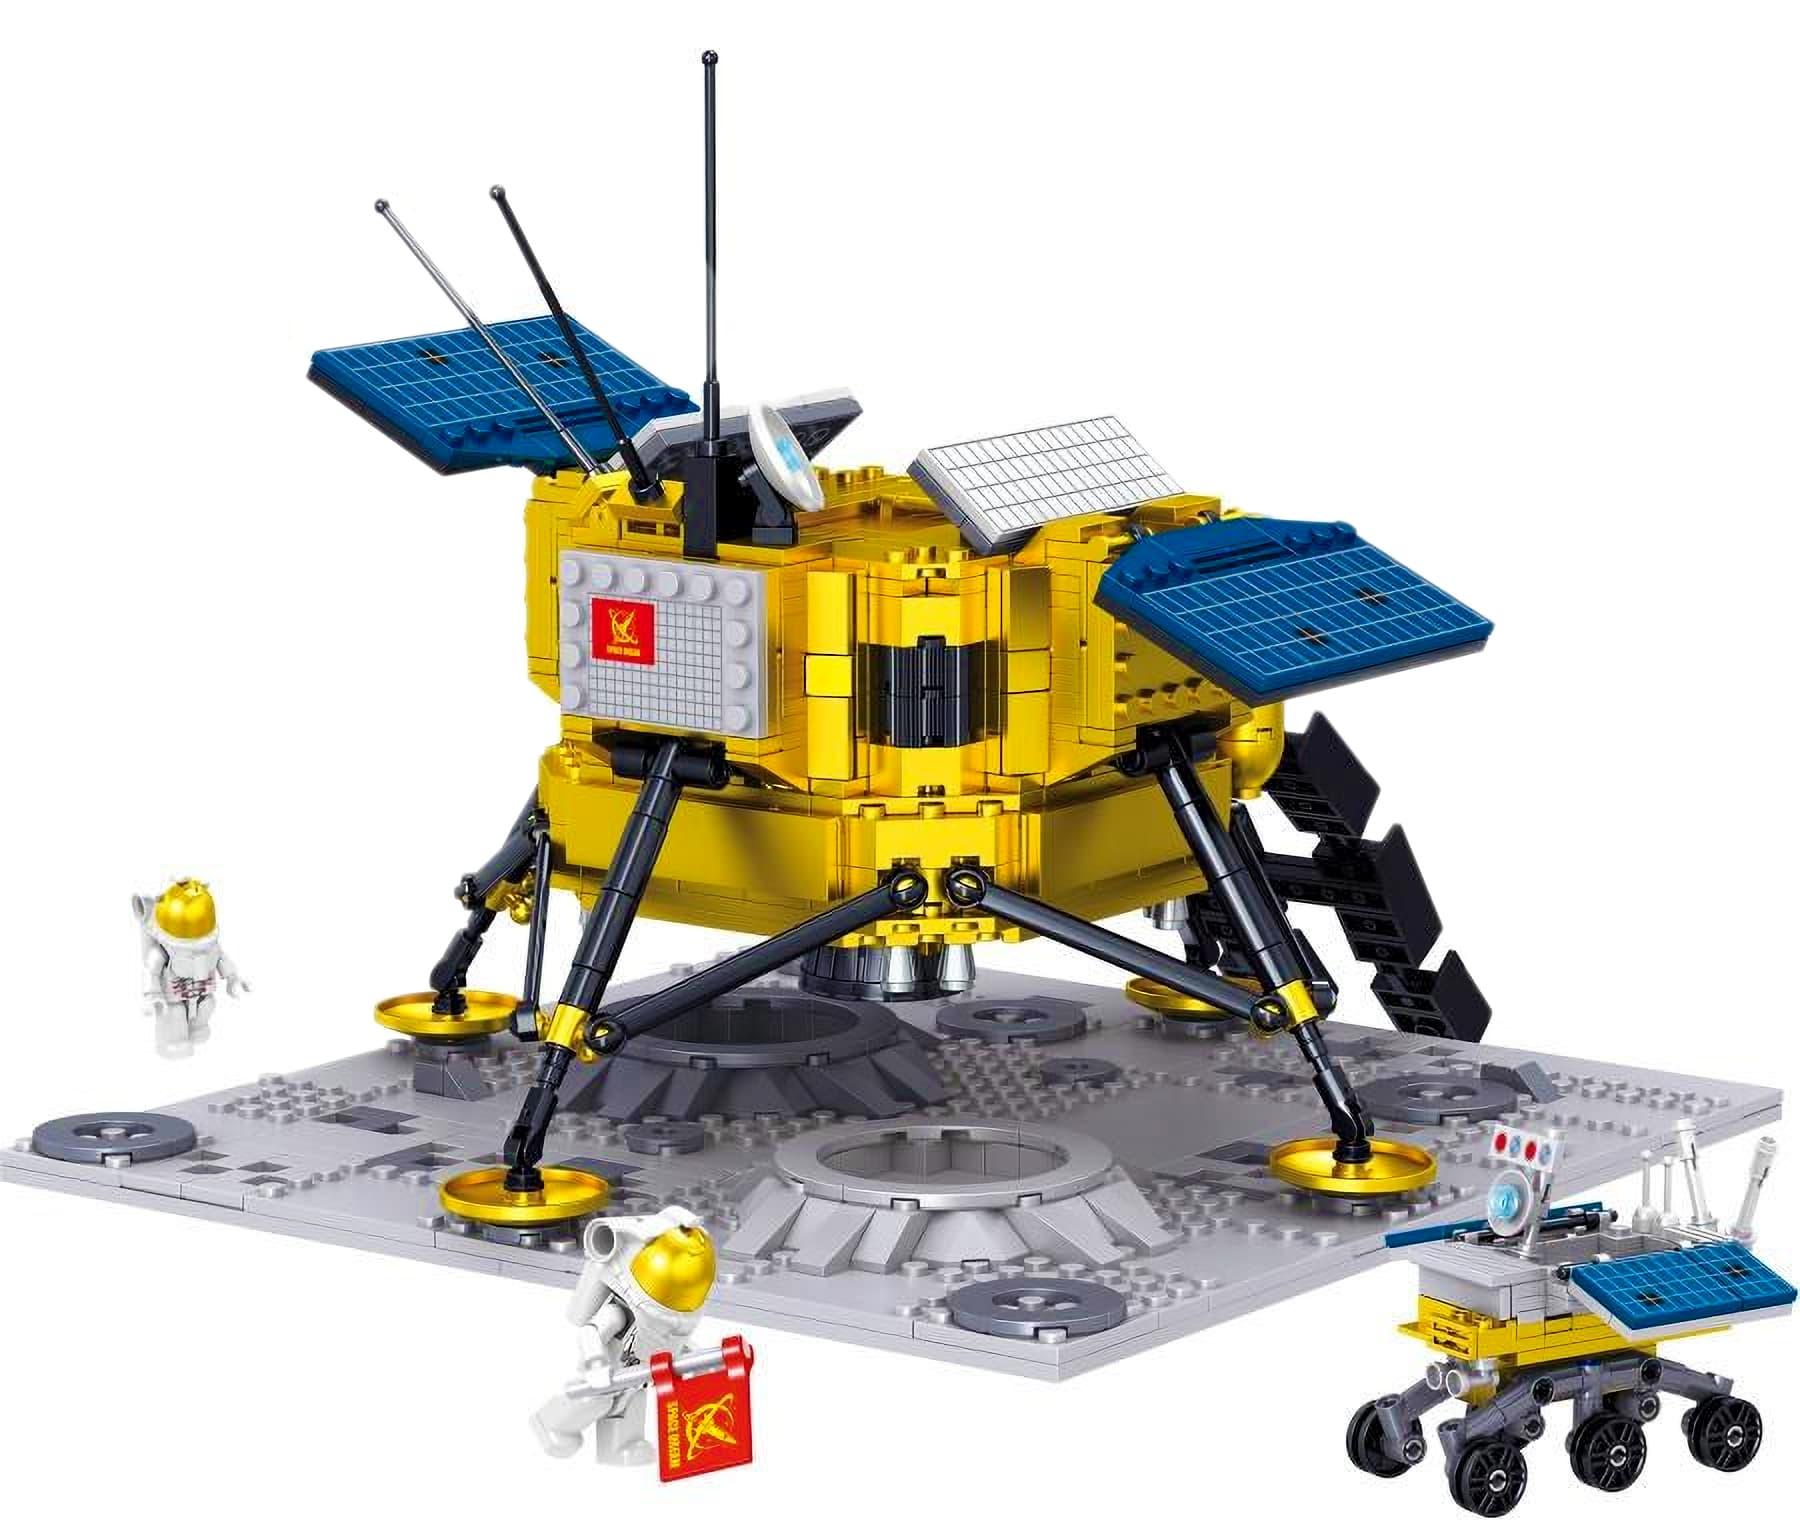 Конструктор Zhe Gao «Космический Луноход» QL0241 / 1148 деталей